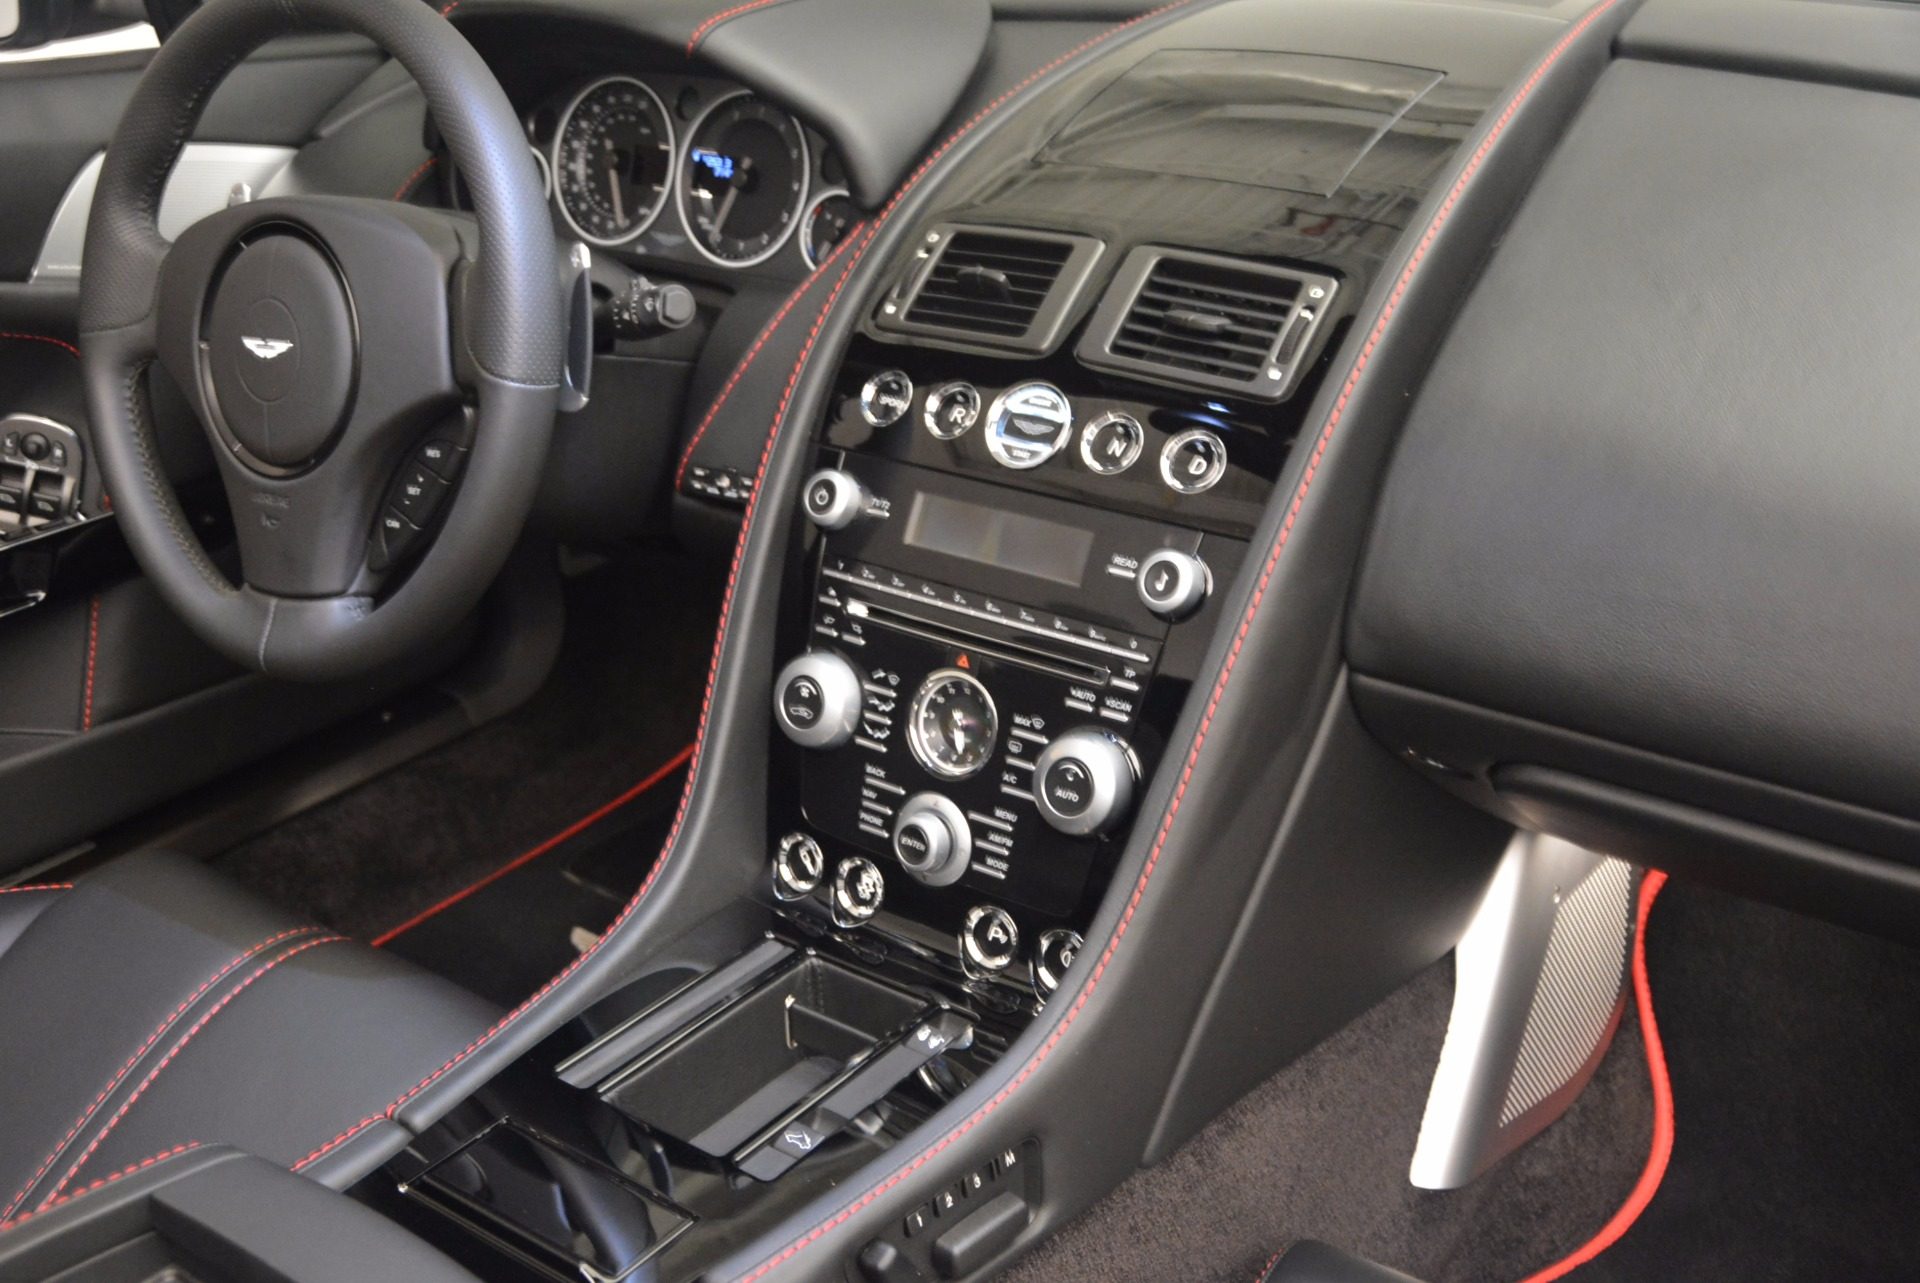 Used 2015 Aston Martin V12 Vantage S Roadster For Sale In Westport, CT 1130_p30